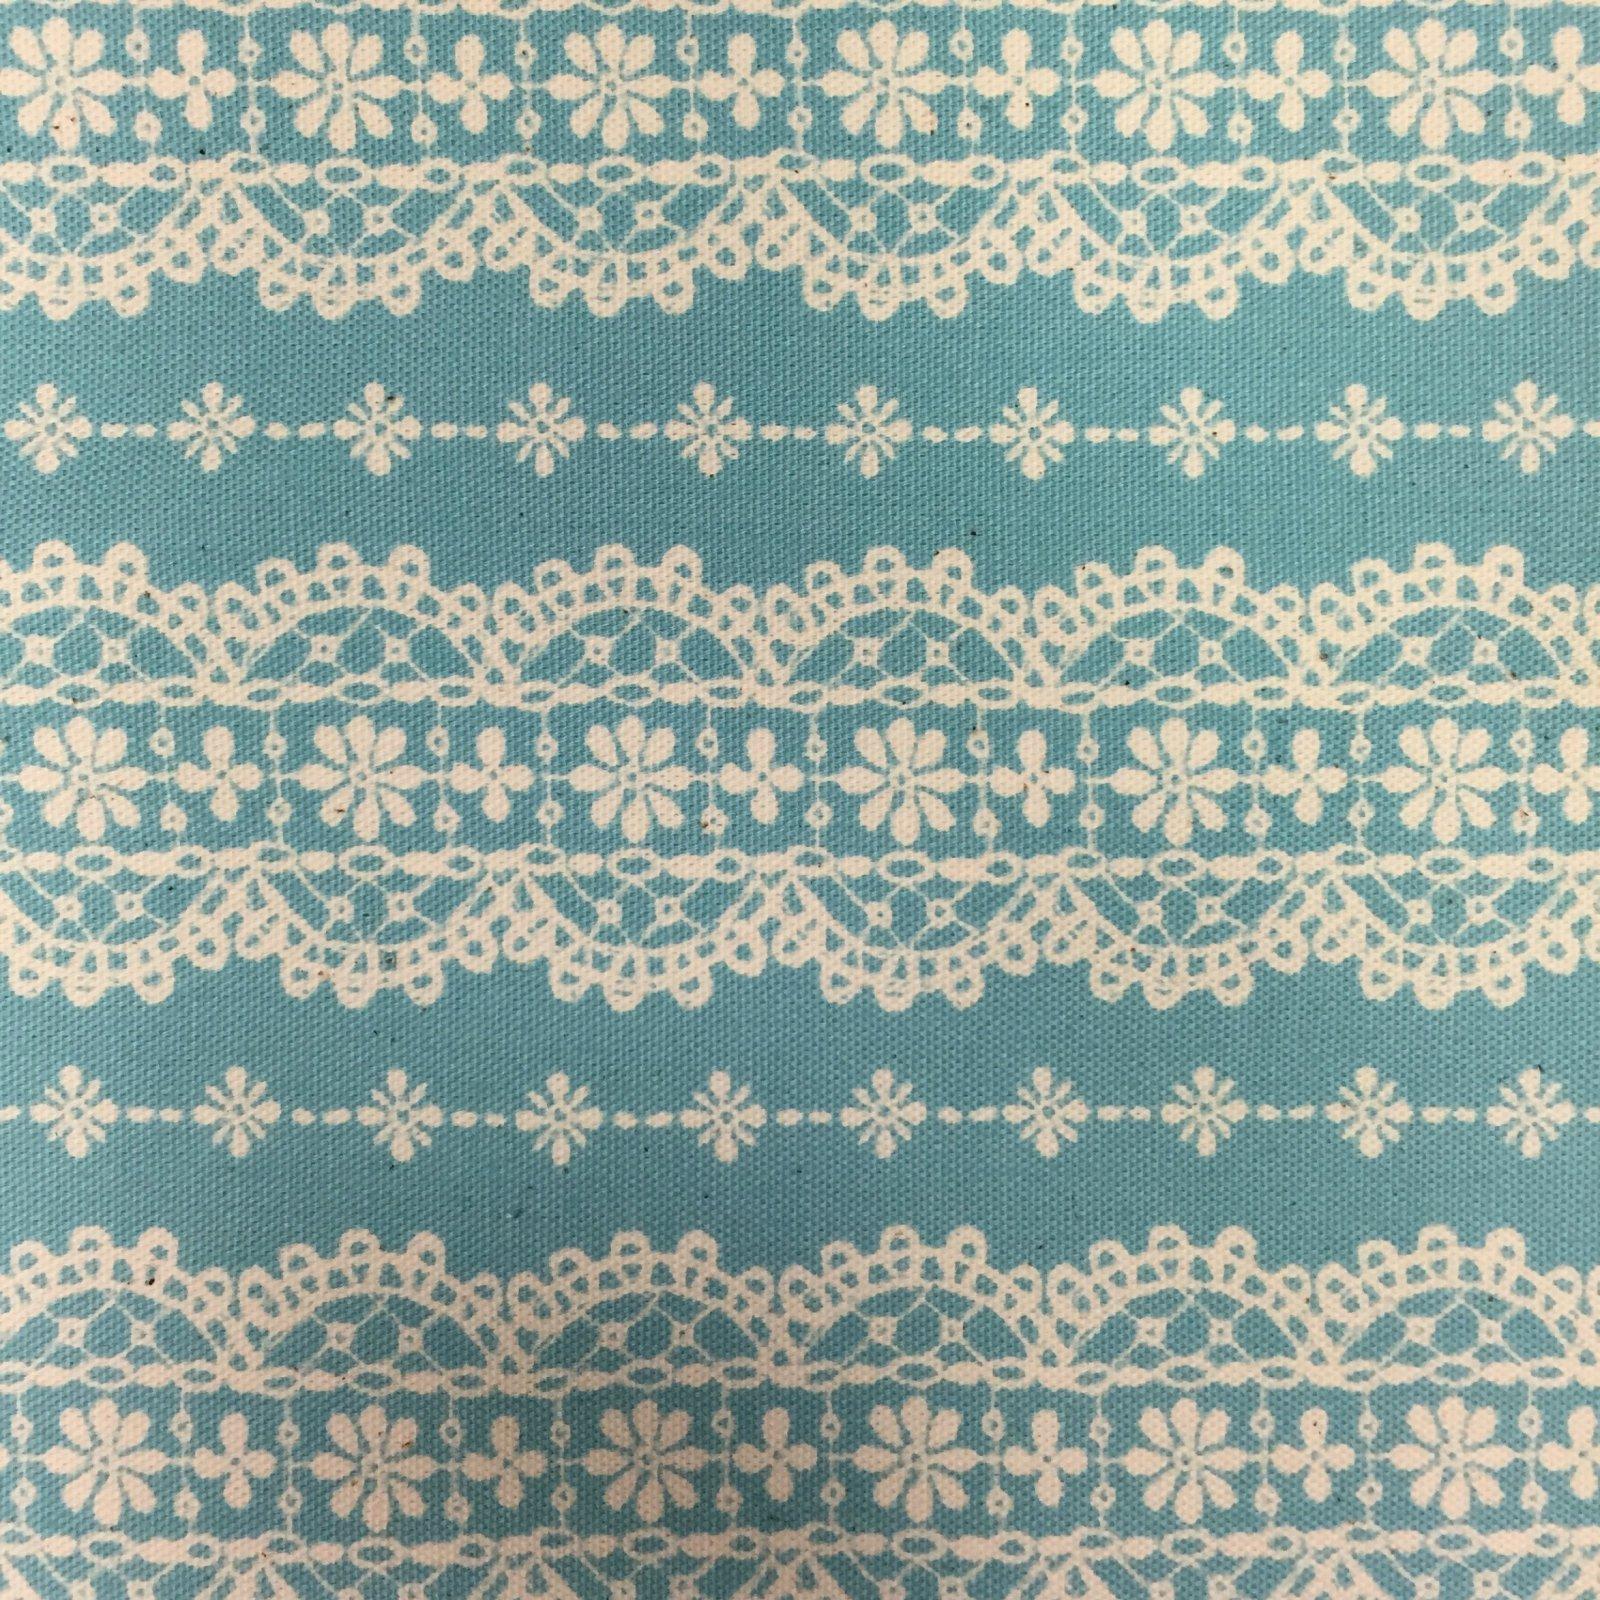 Kokka - Alice in Wonderland - Blue Lace